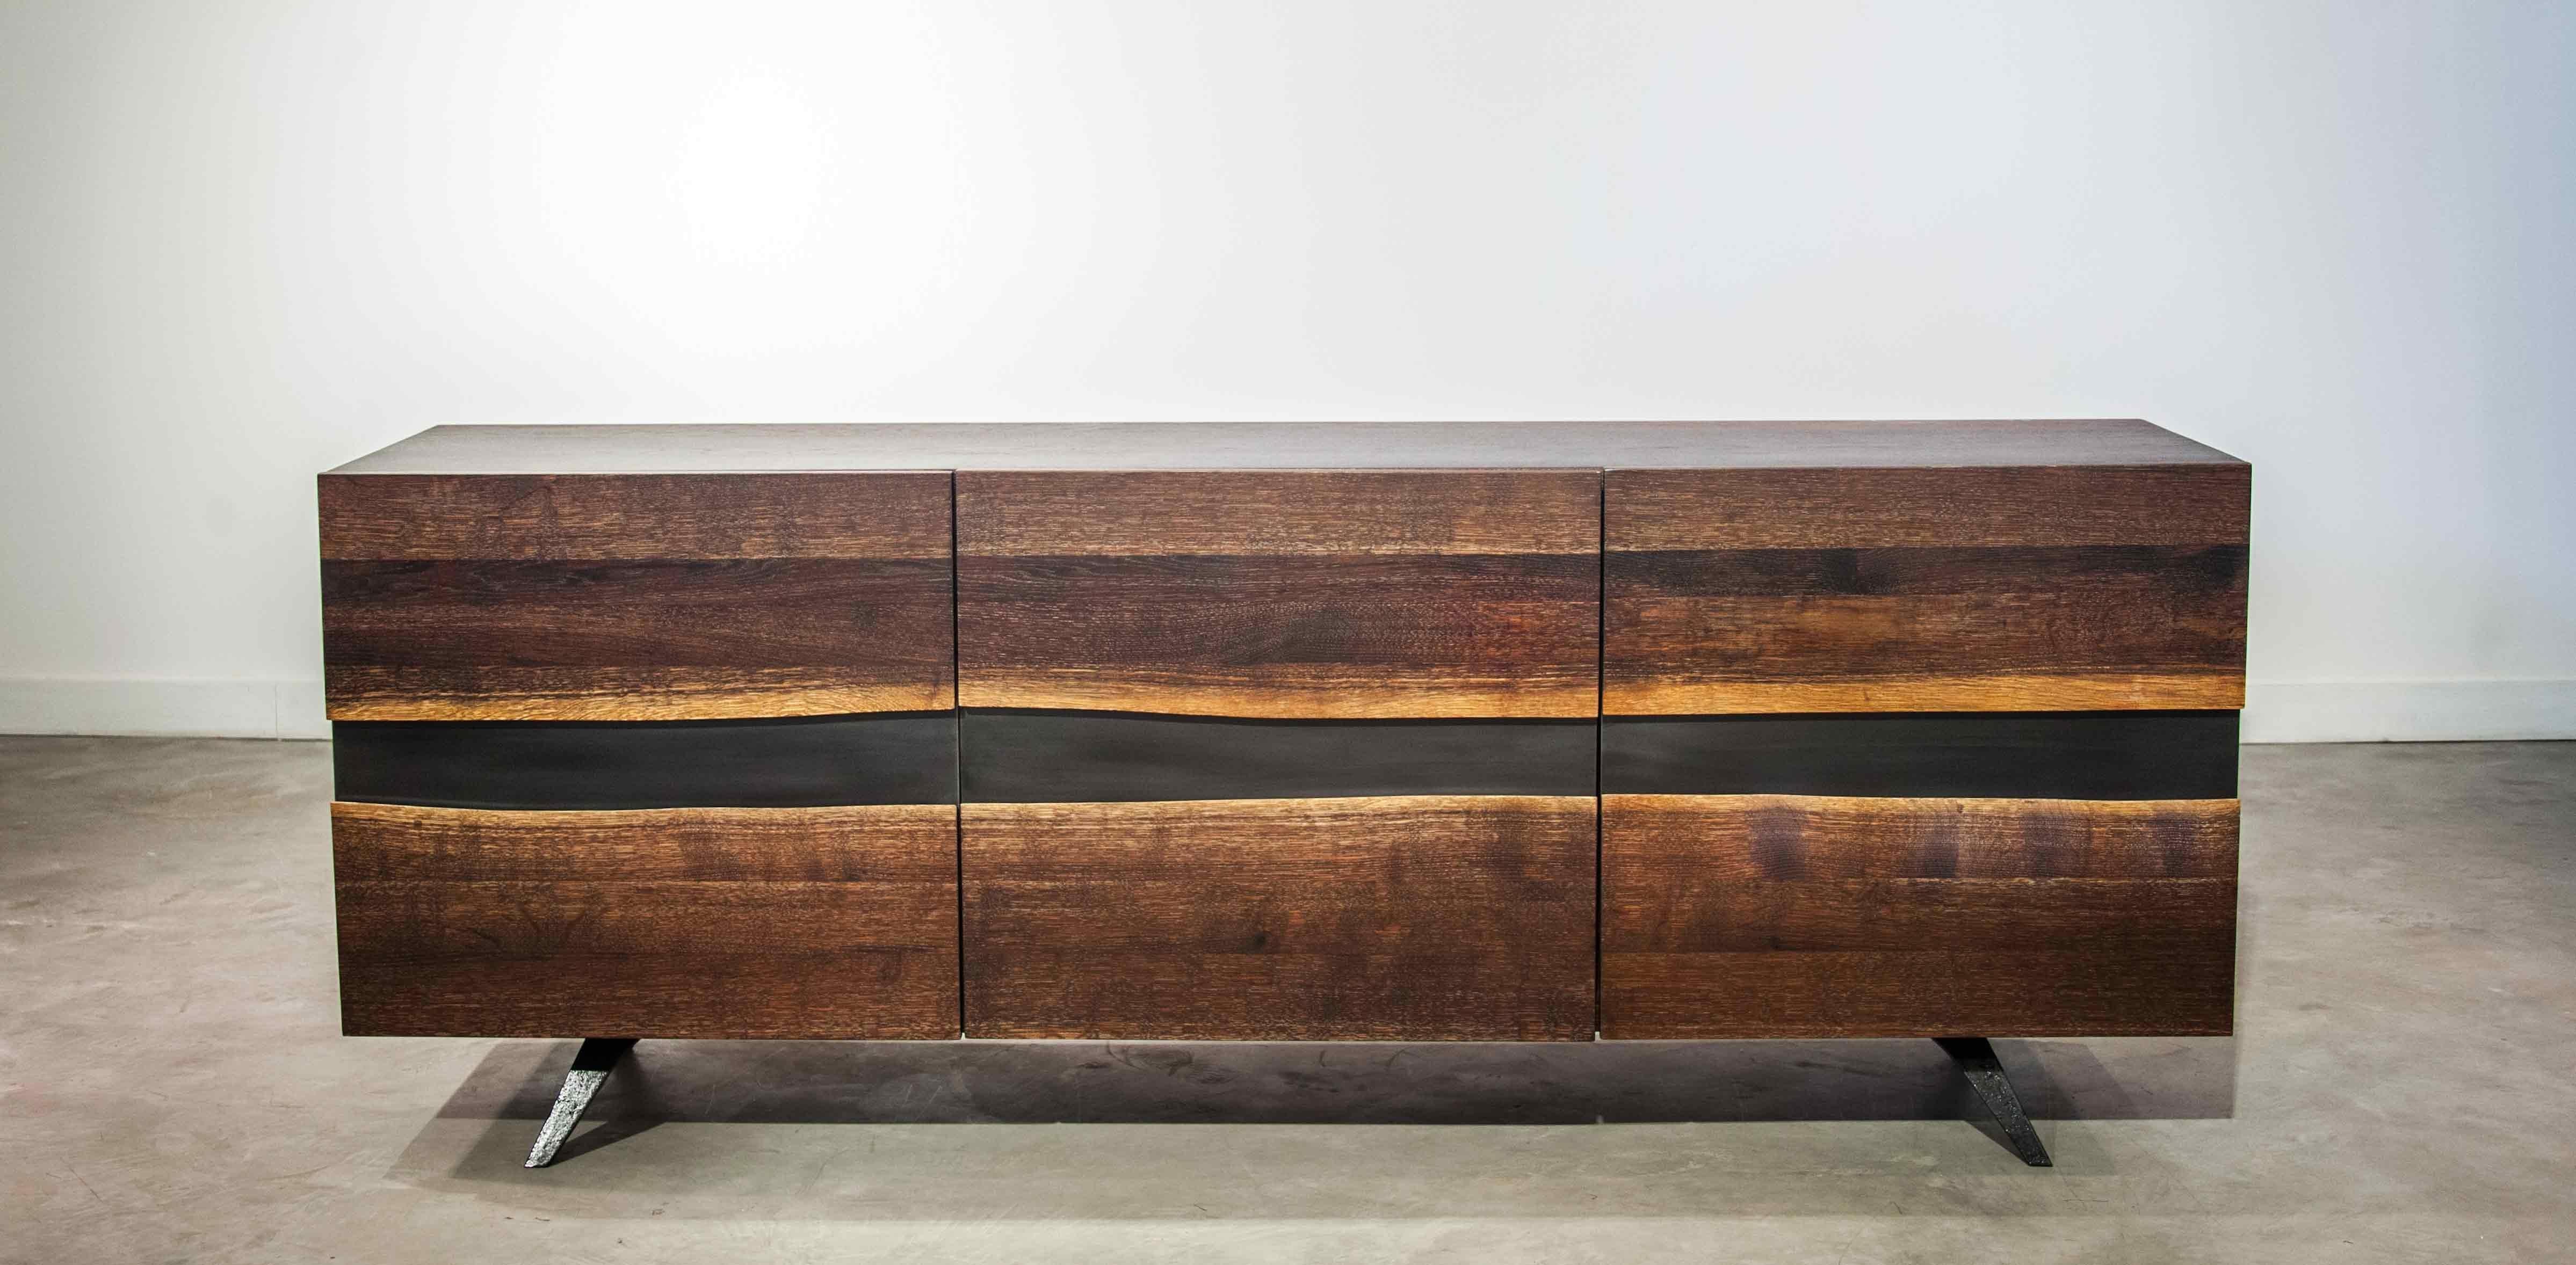 Vega Sideboard | Seared Oak - Thin & Bold within Black Oak Wood and Wrought Iron Sideboards (Image 29 of 30)